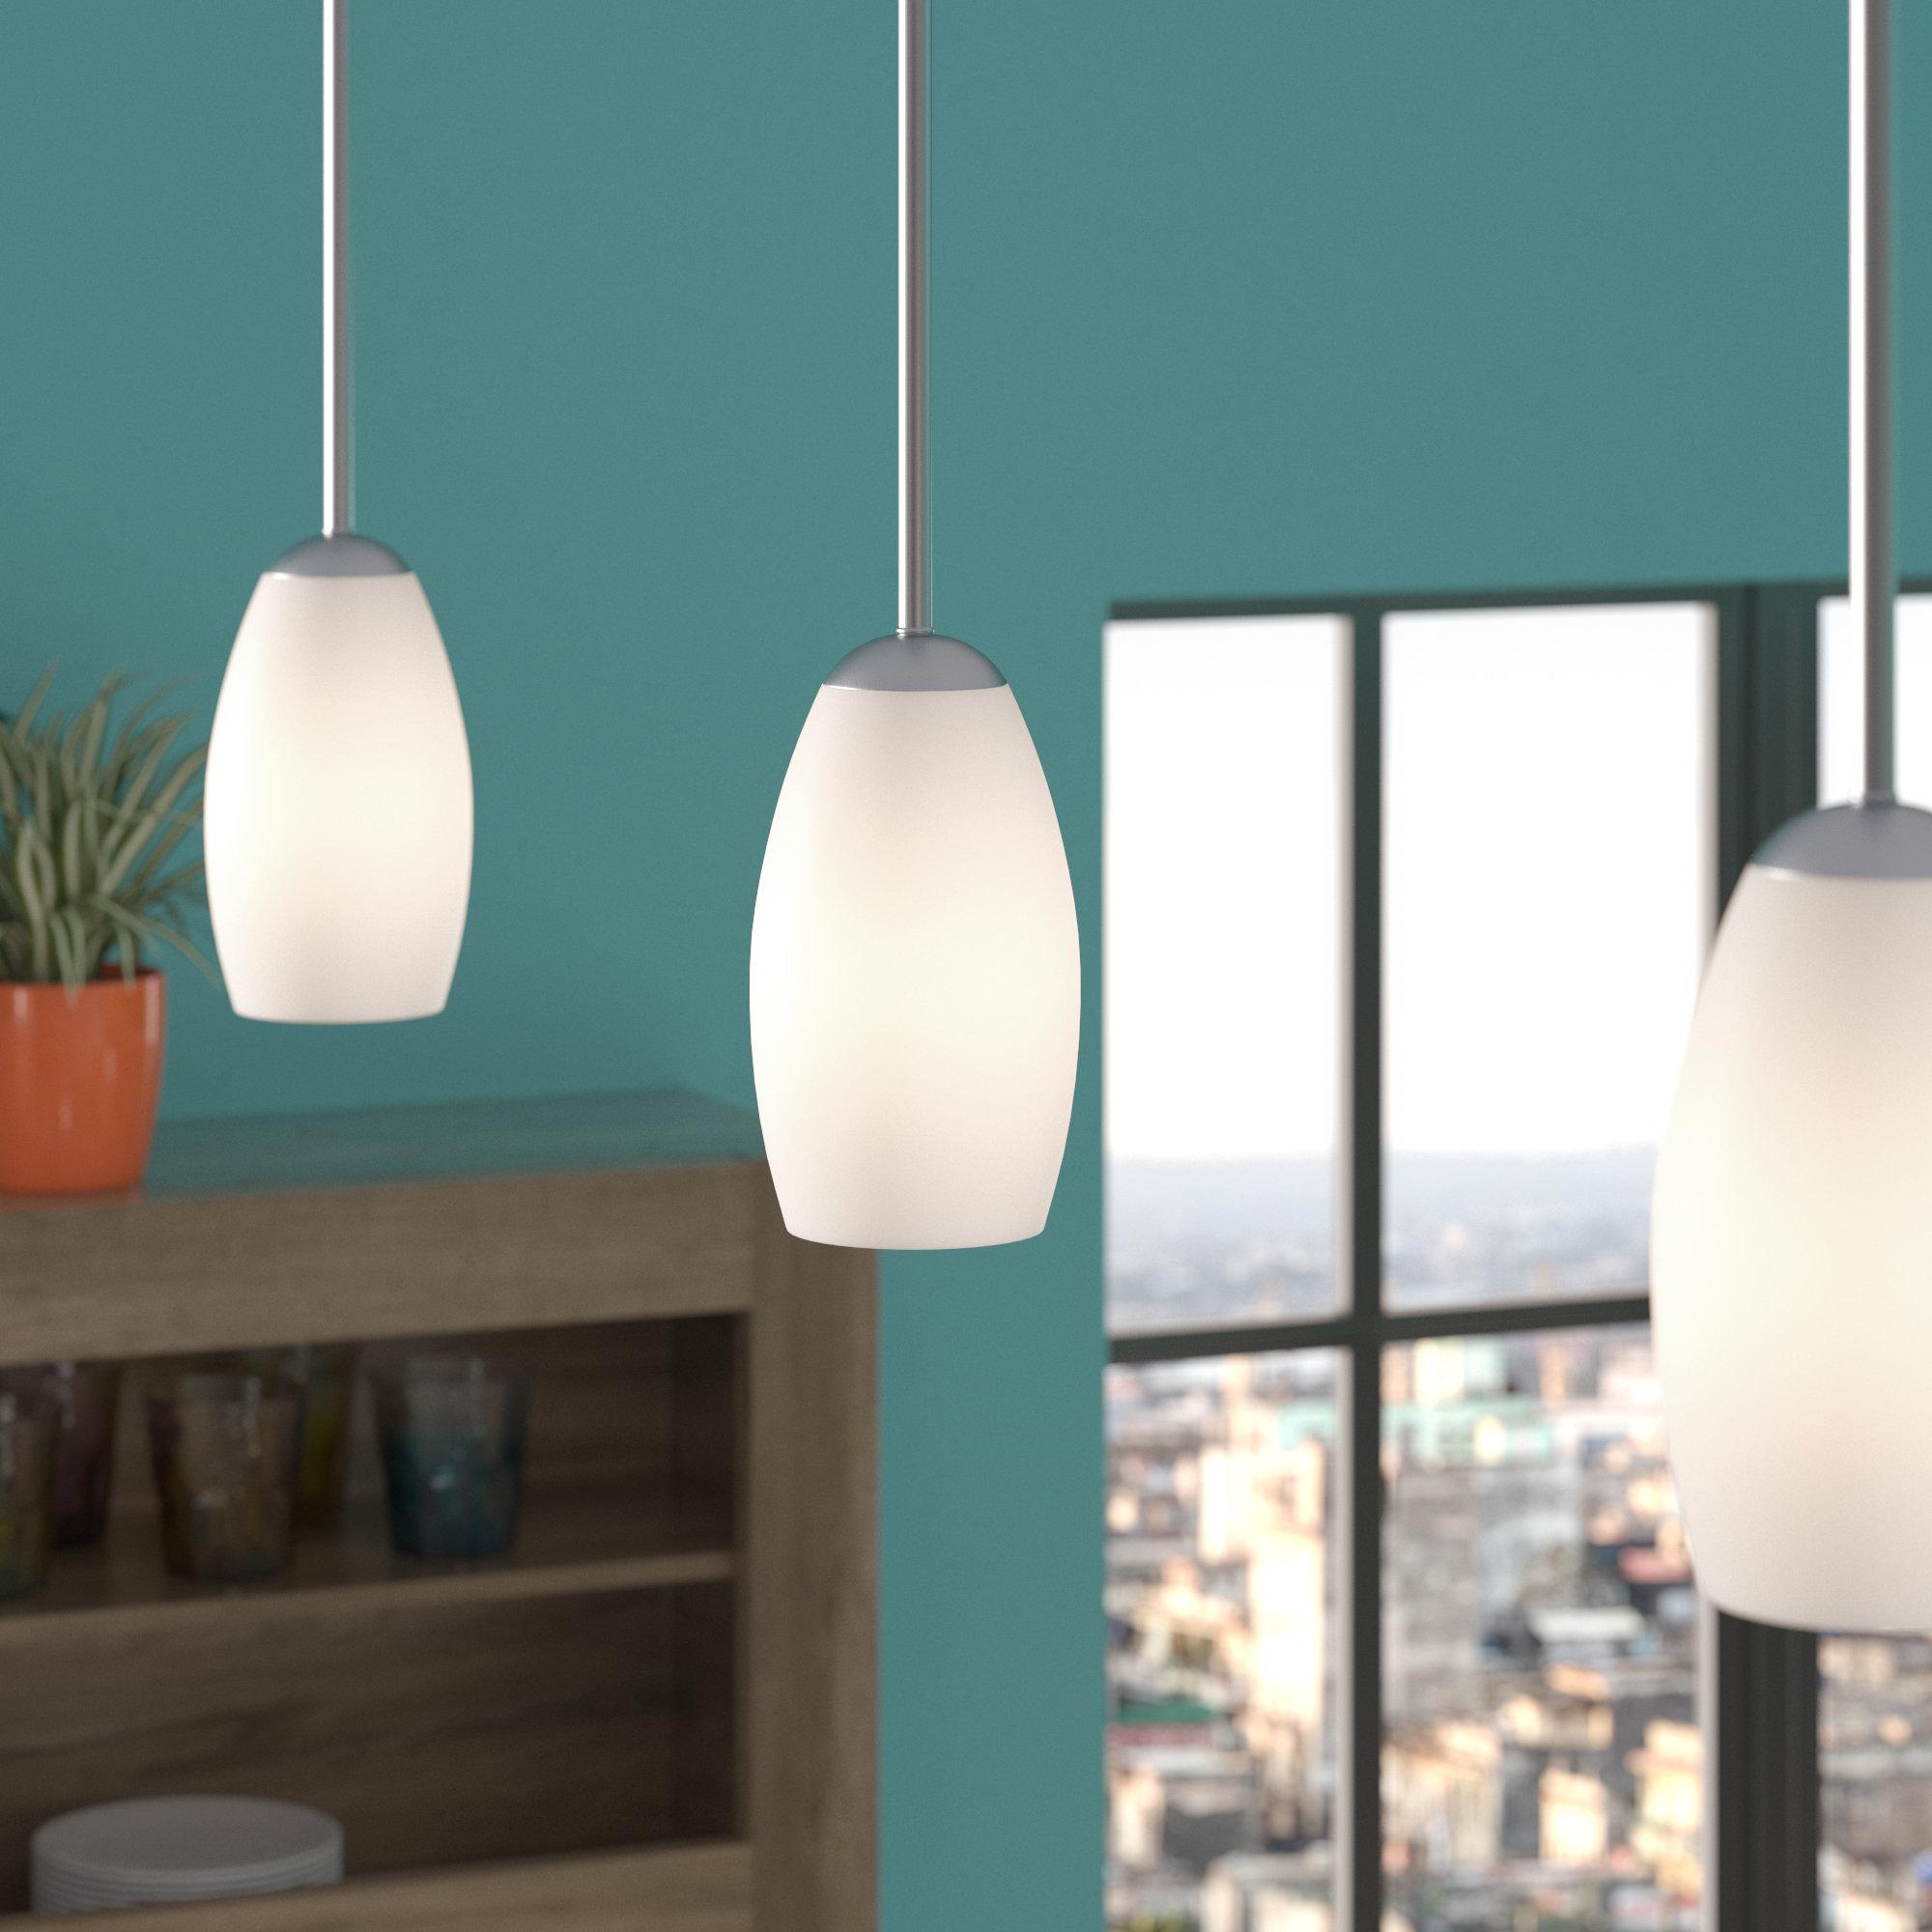 Guro 1 Light Cone Pendants Throughout 2020 Guro 1 Light Cone Pendant (Gallery 1 of 20)